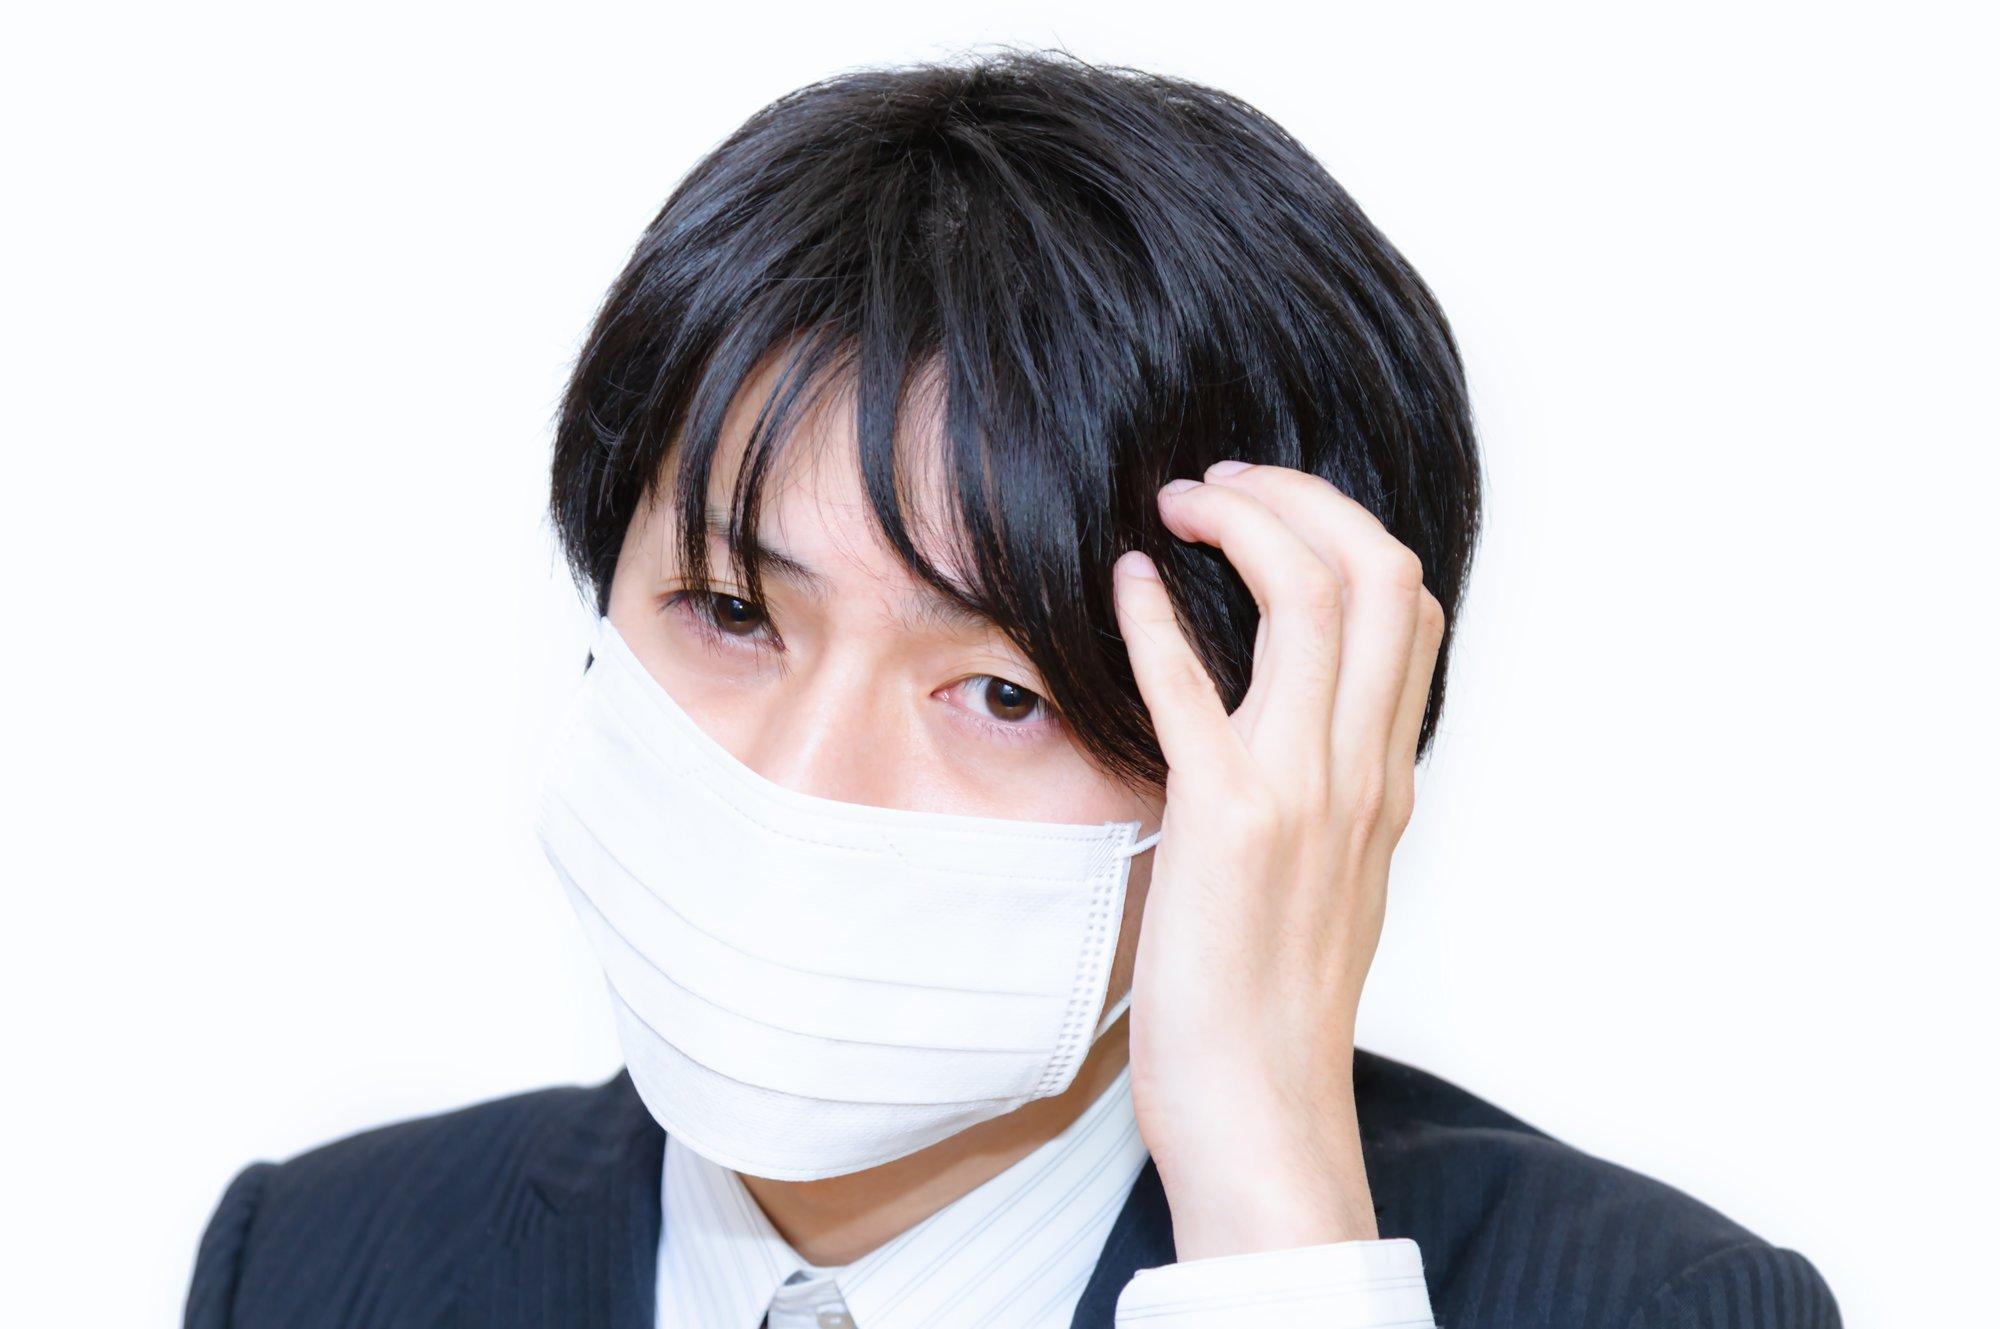 PAK24_kazehiitakamoshirenai1343_TP_V3